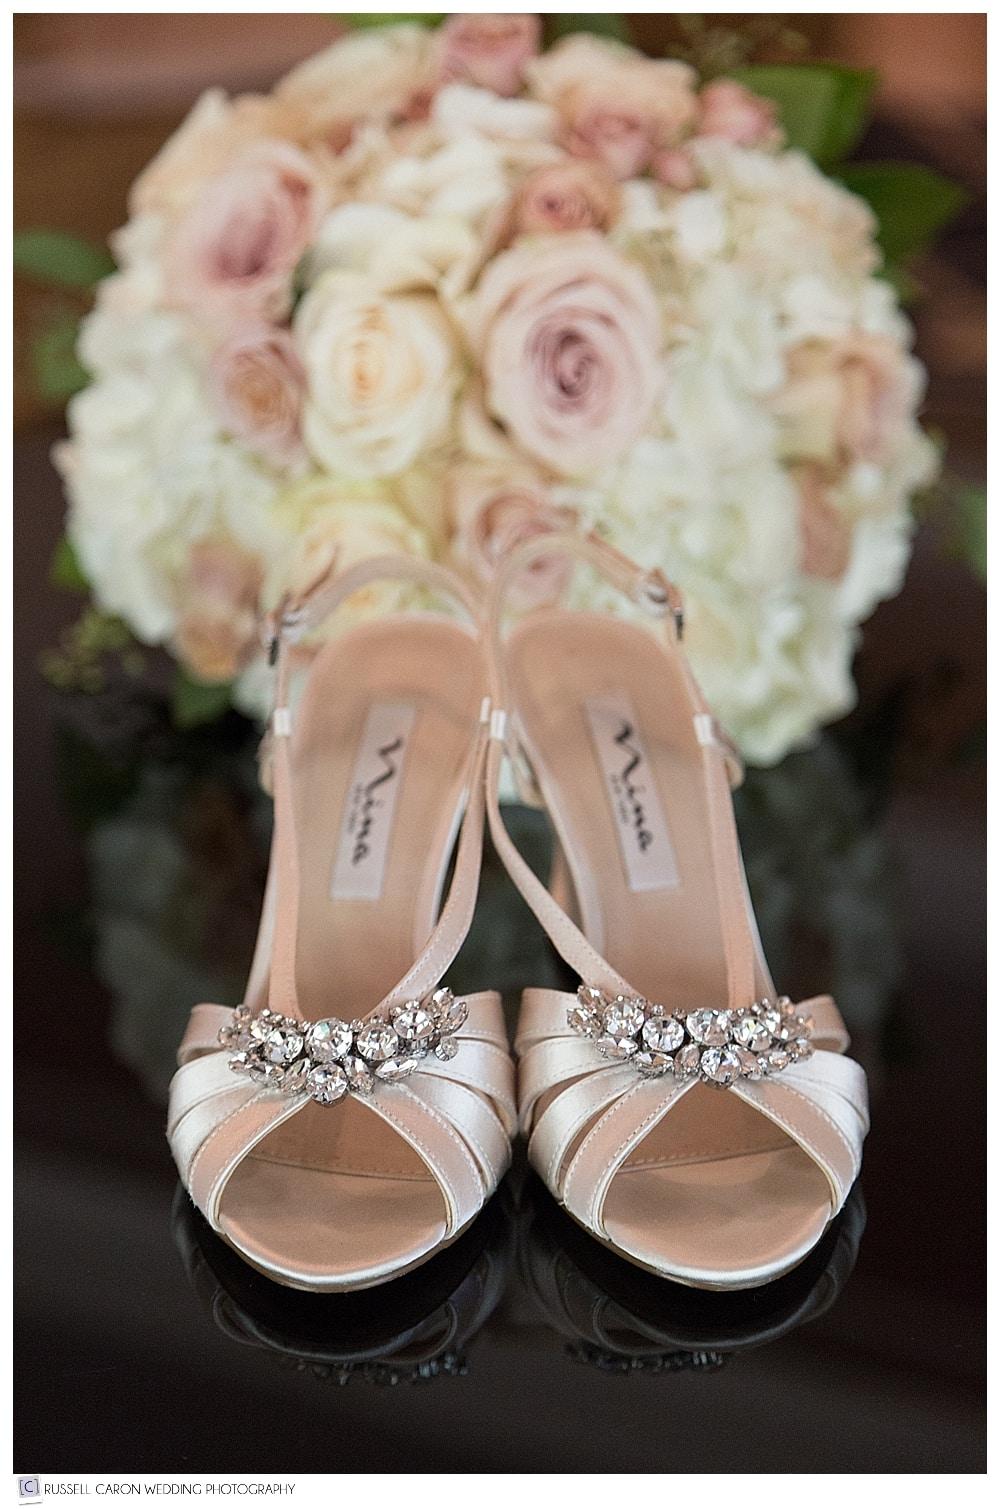 Bride's shoes and bouquet detail photo